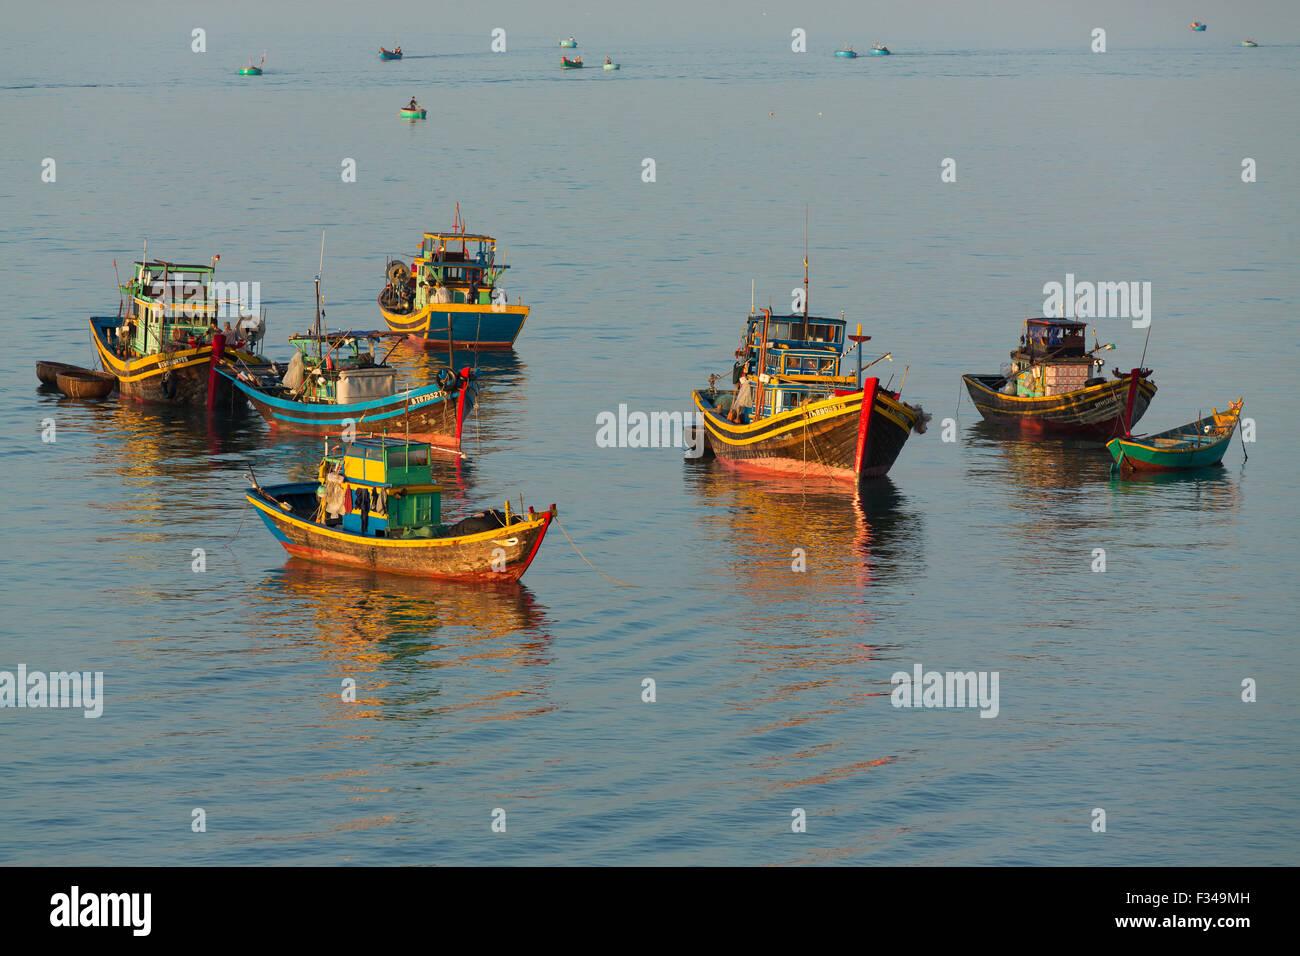 boats anchored off Mũi Né fishing village, Bình Thuận Province, Vietnam Stock Photo